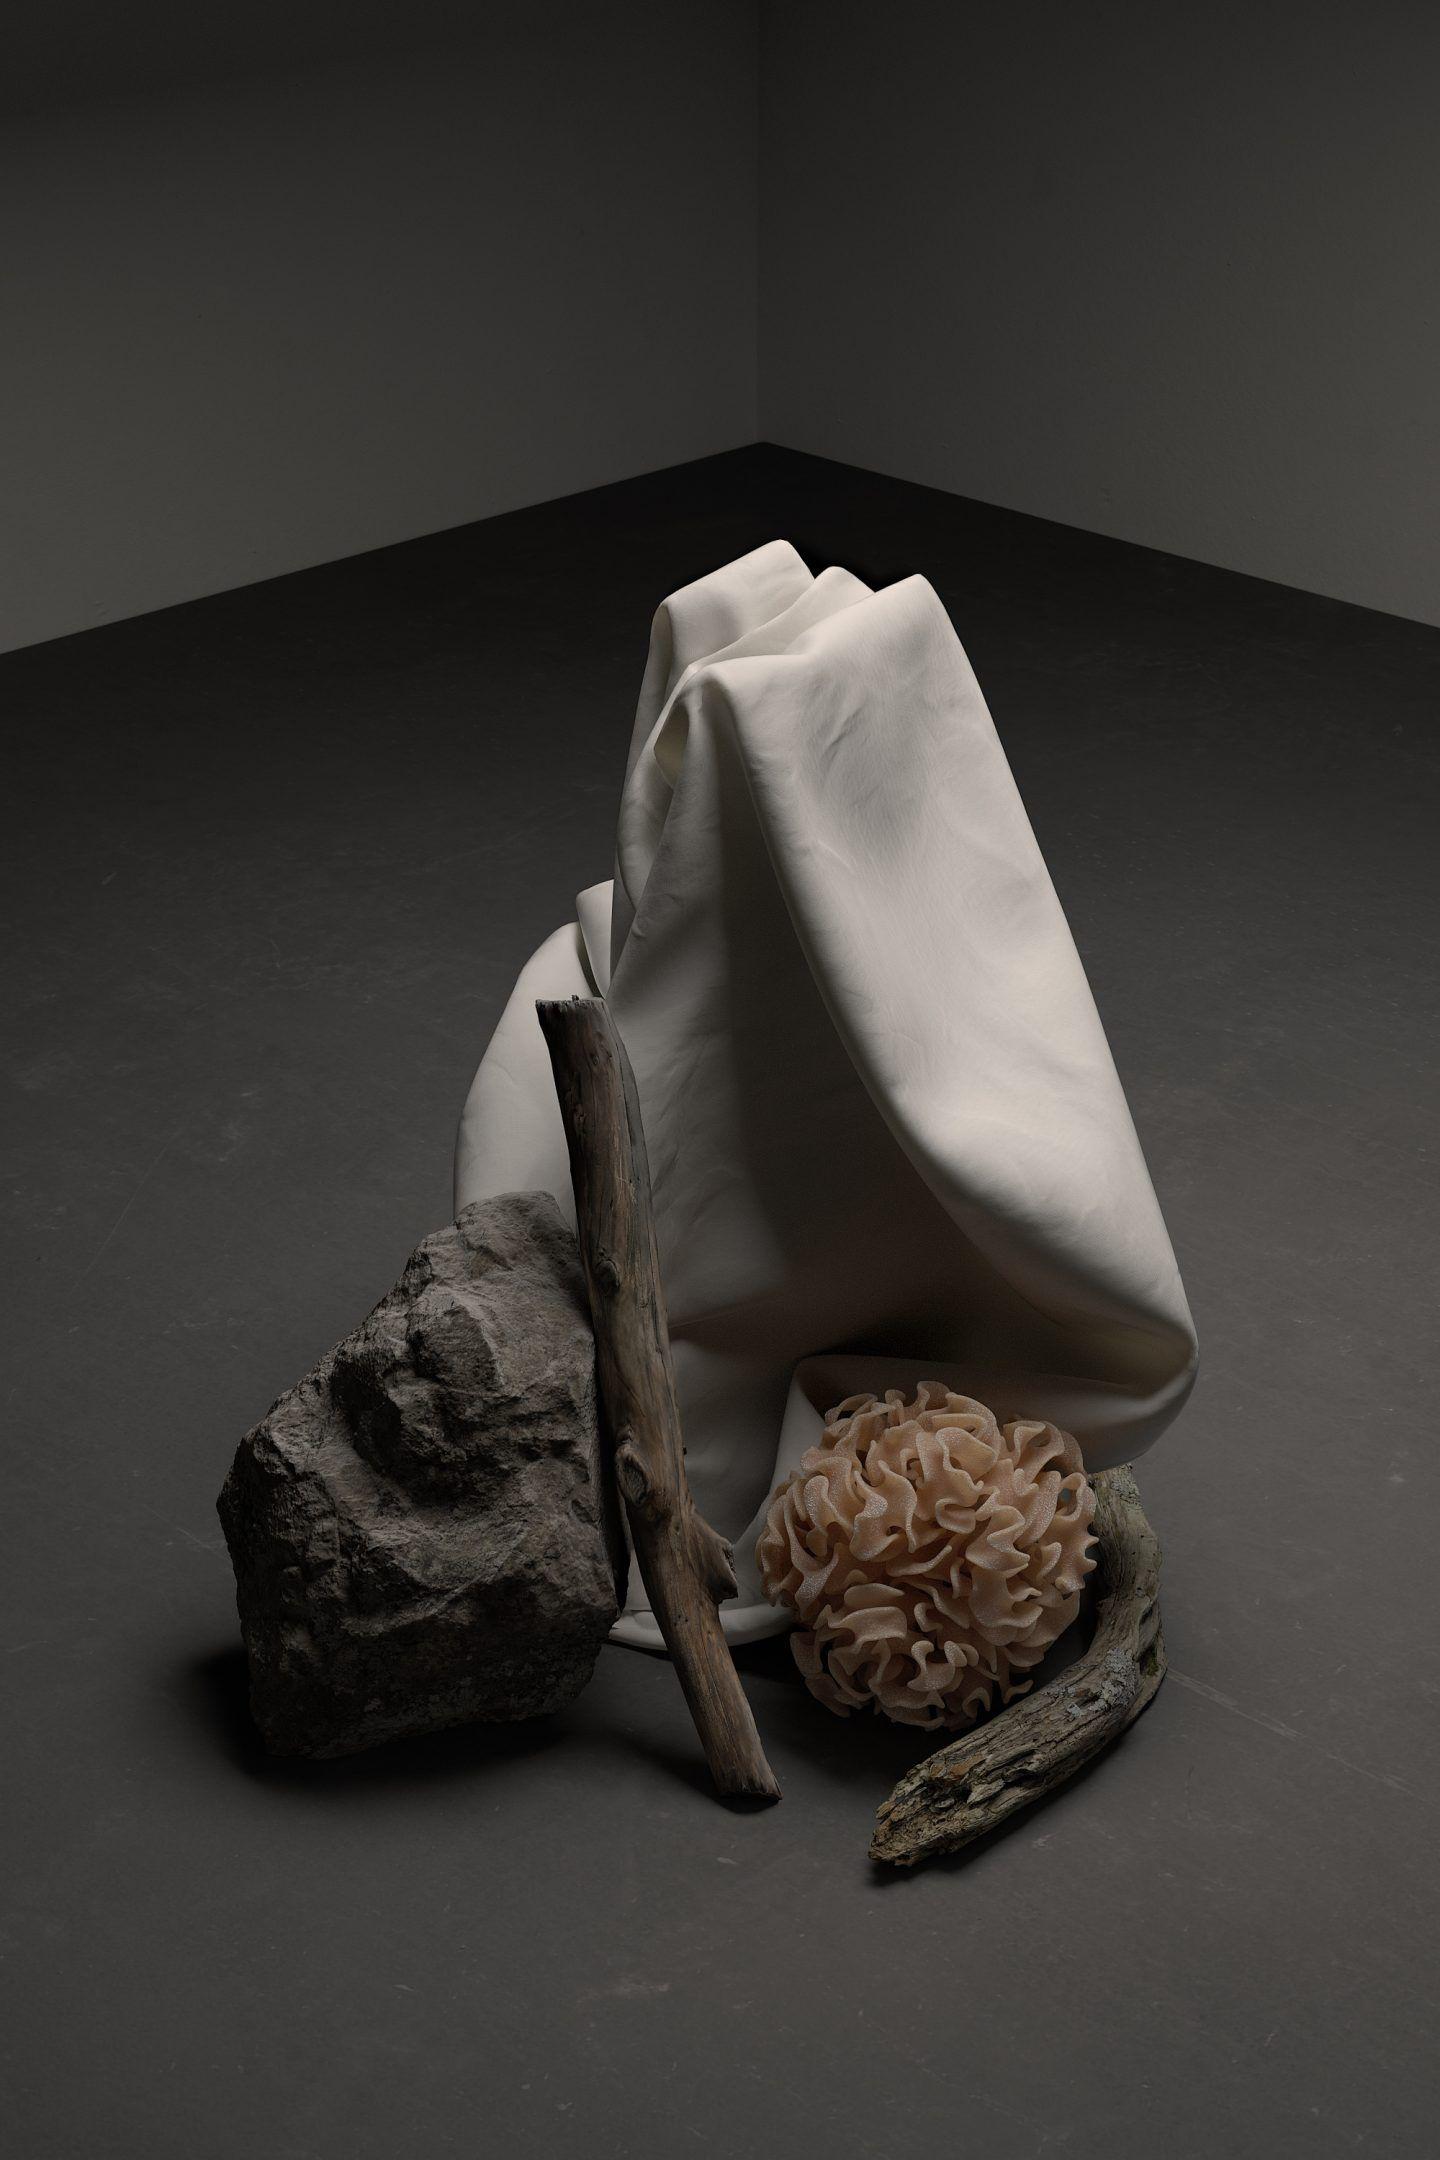 IGNANT-Art-Digital-Taupe-Chiaroscuro-1